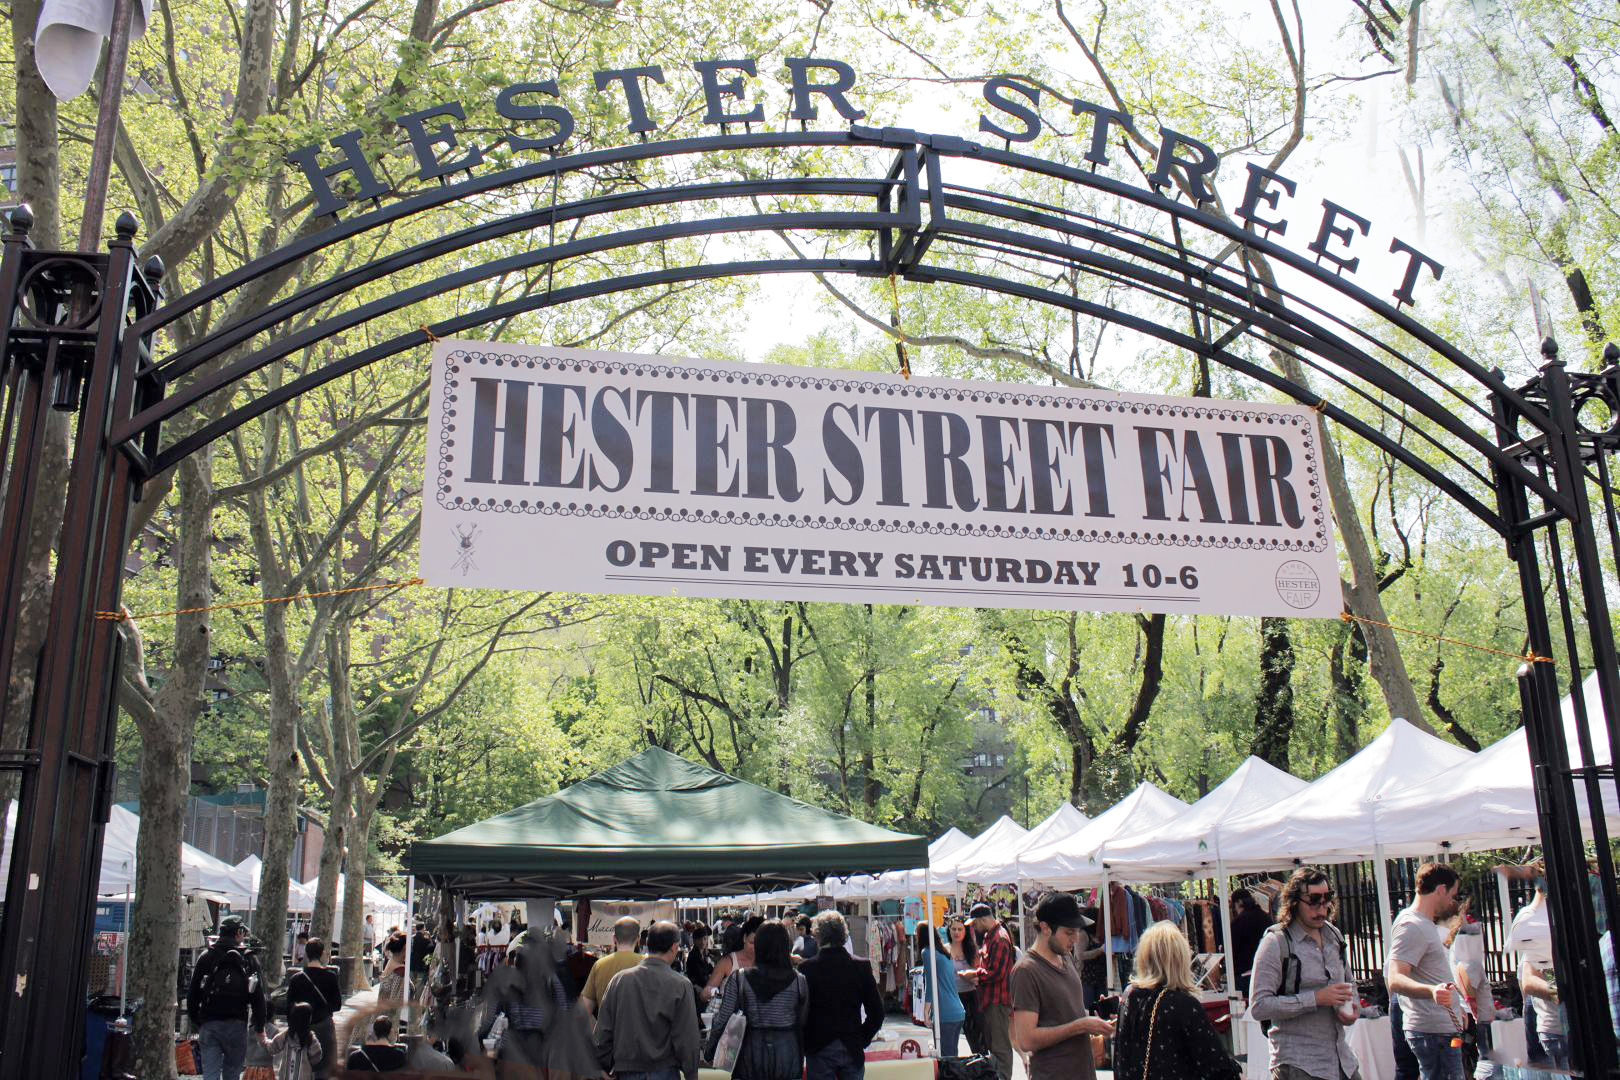 Hester-St-Fair